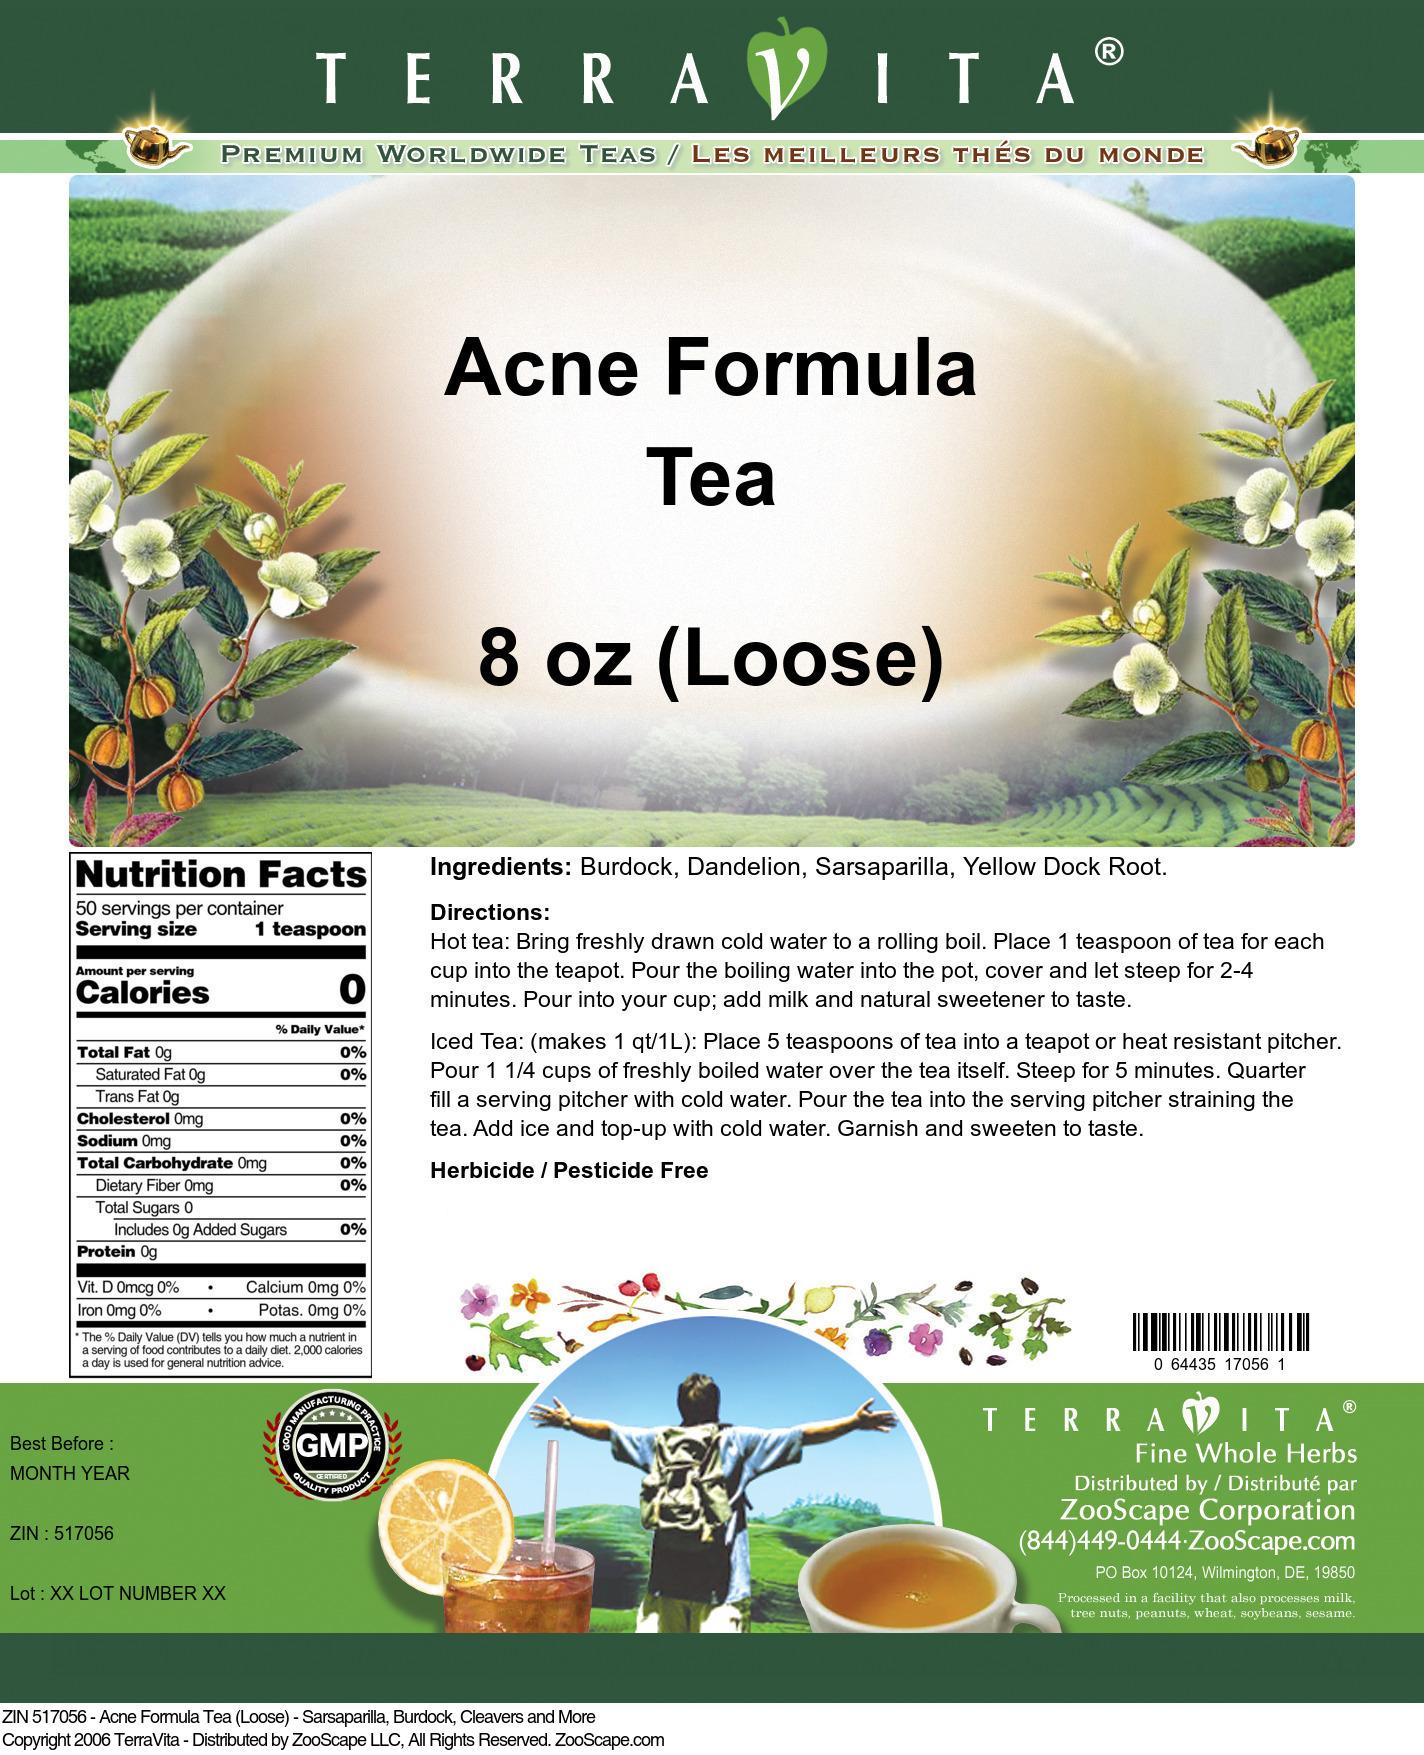 Acne Formula Tea (Loose) - Sarsaparilla, Burdock, Cleavers and More